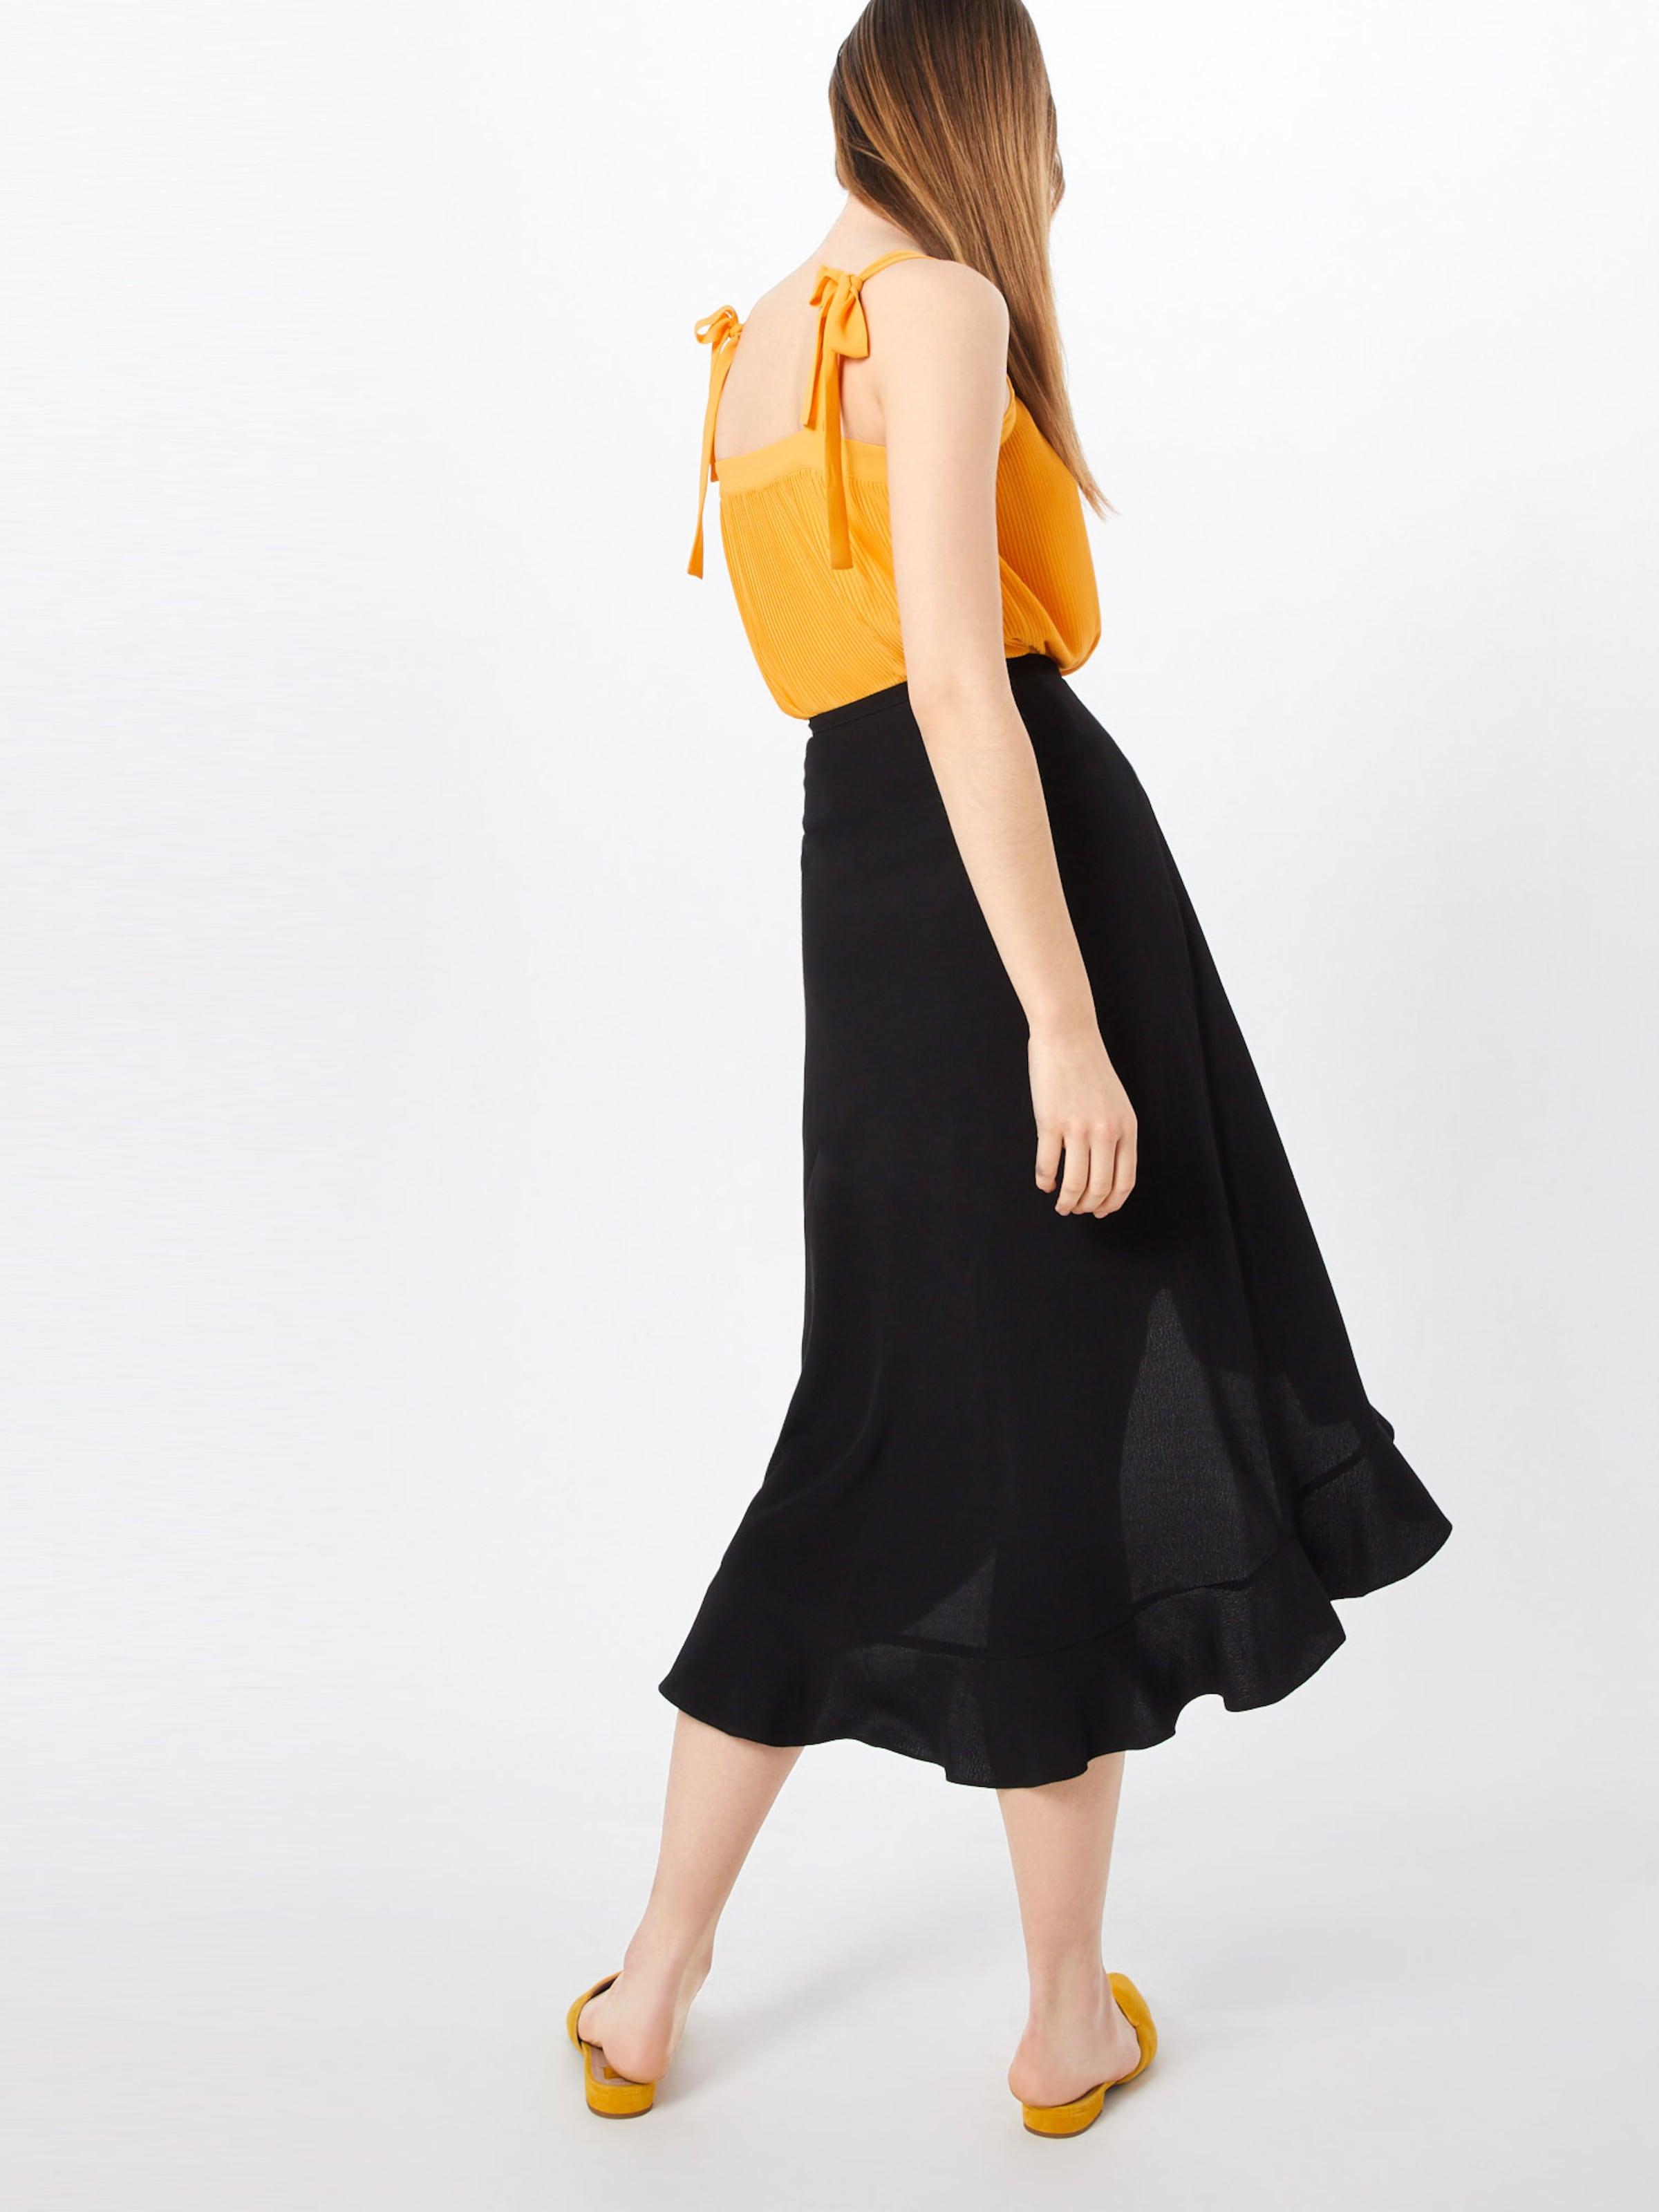 Jupe Noir Samsoeamp; 'limon En 6515' L Wrap Skirt tdCxrQBhs